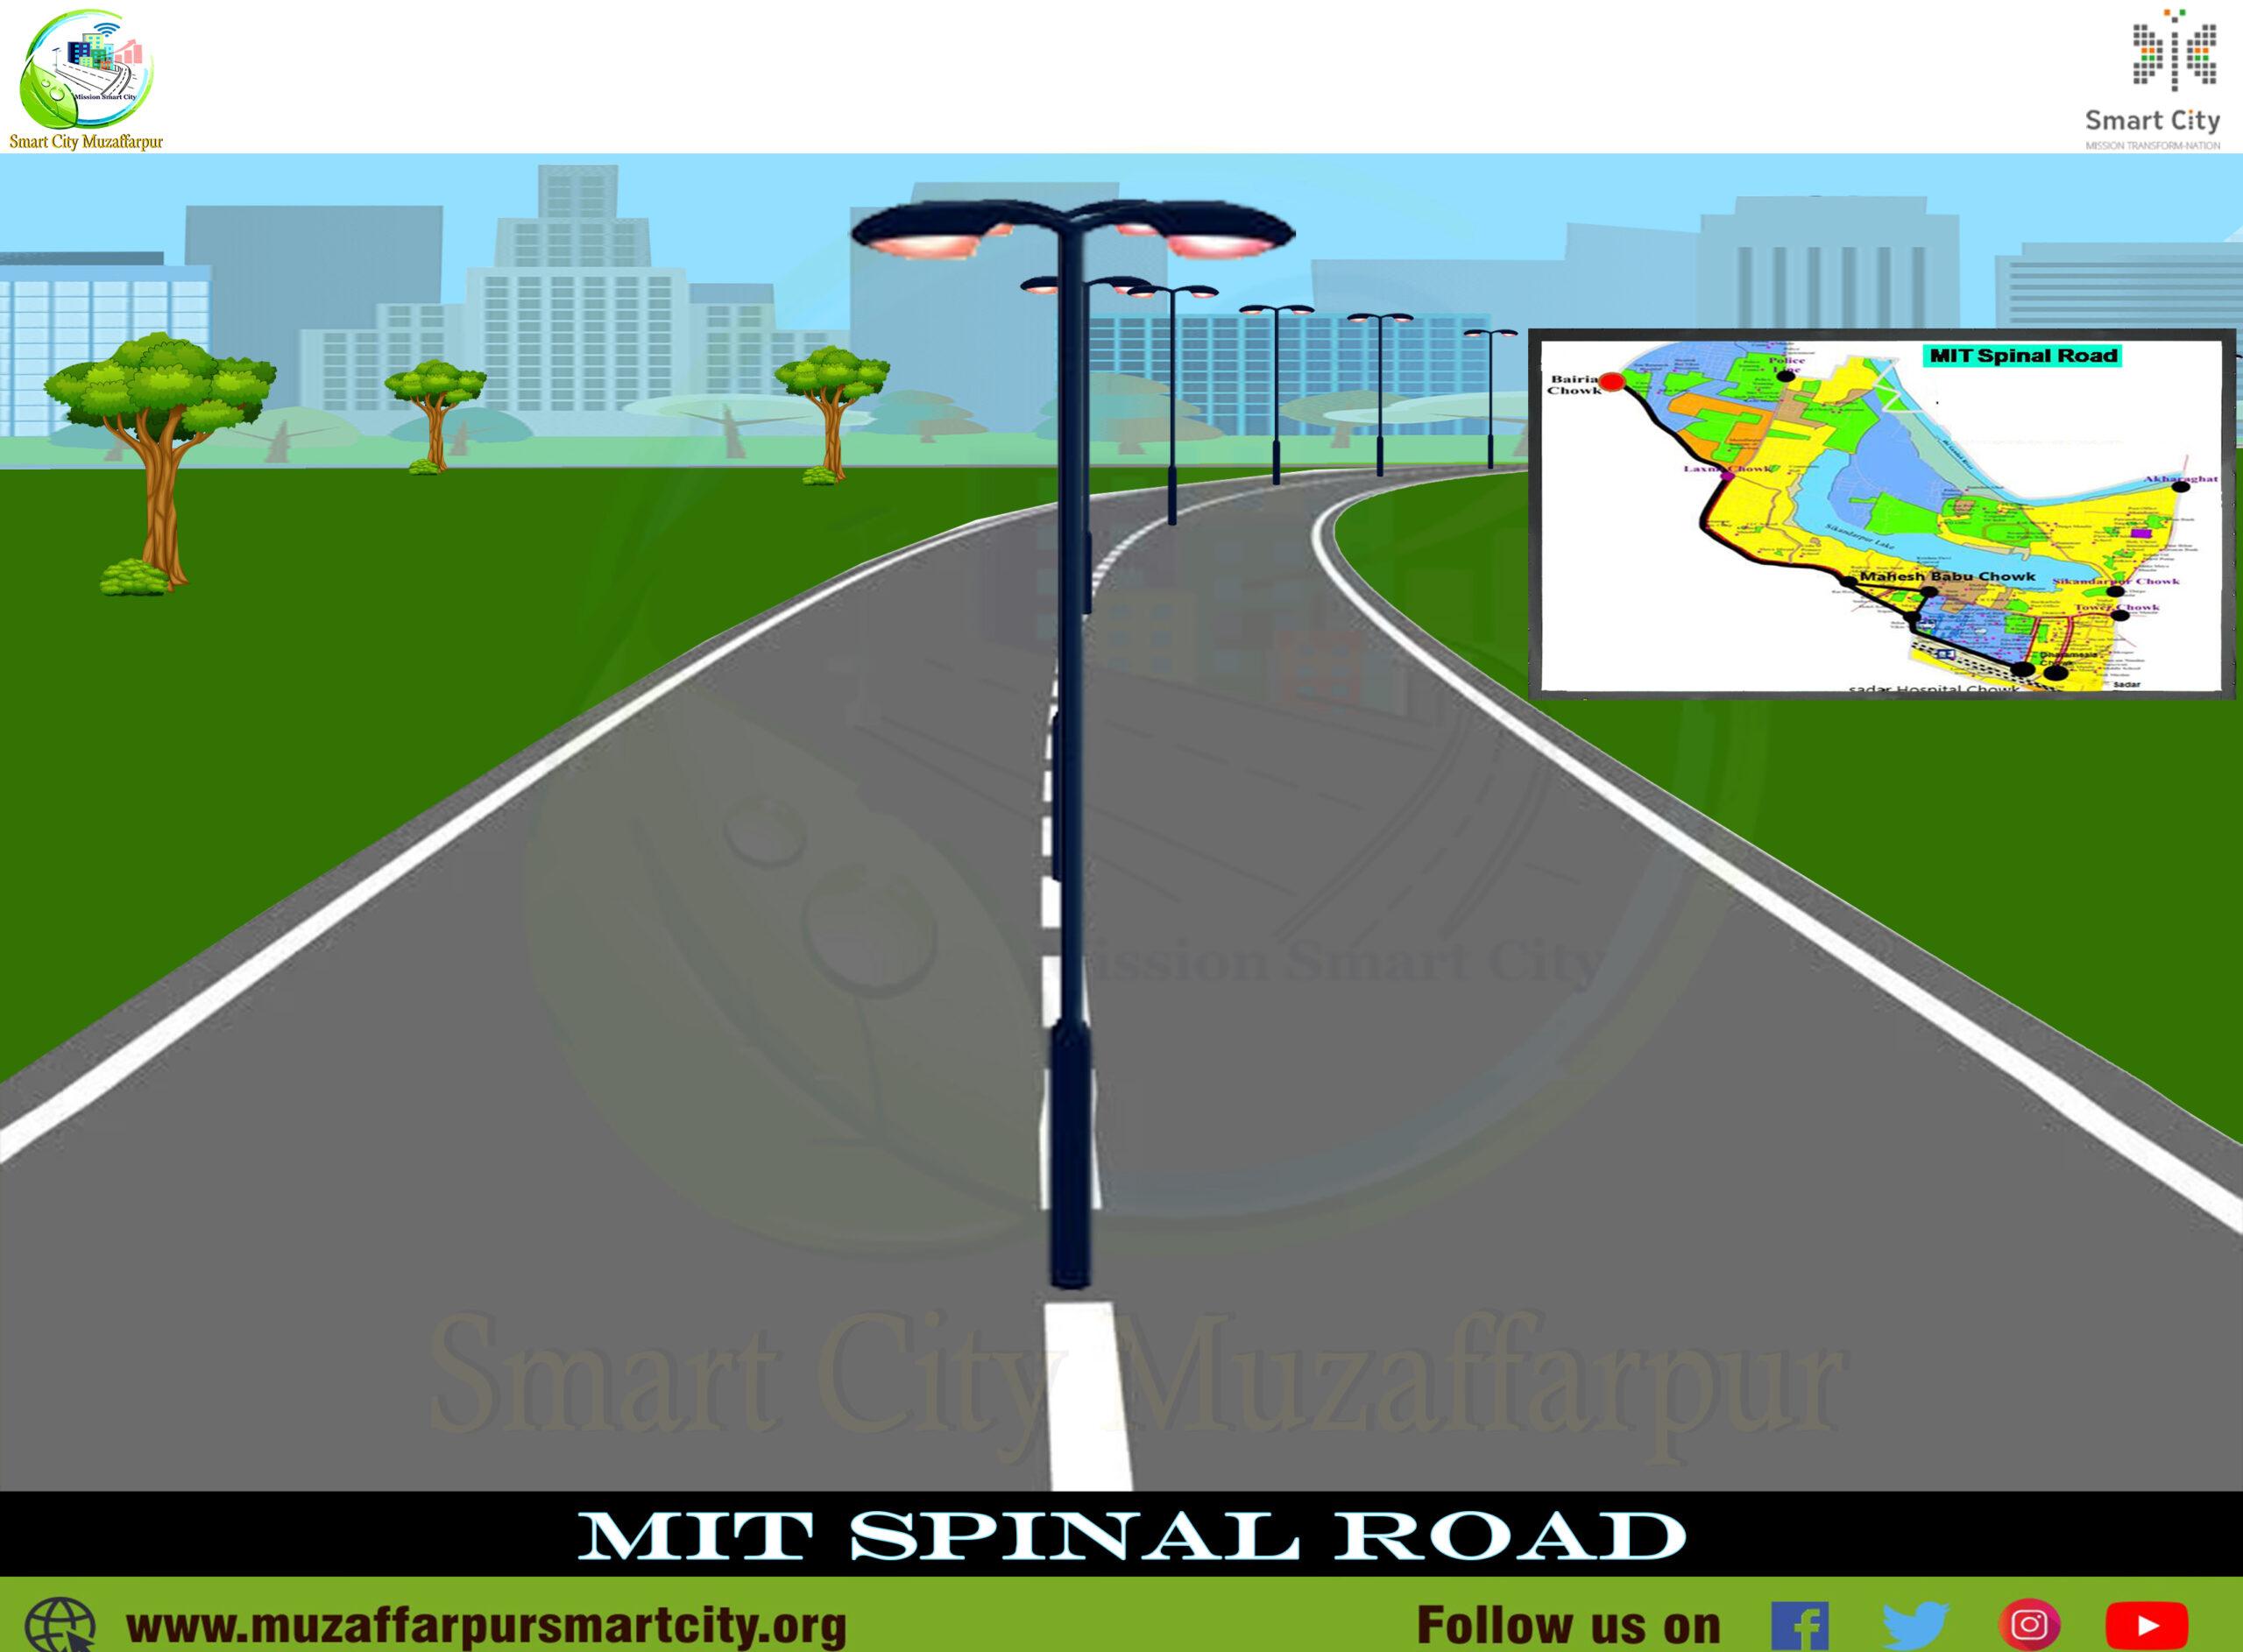 Muzafarpur Smart City Spinal Road of Muzaffarpur